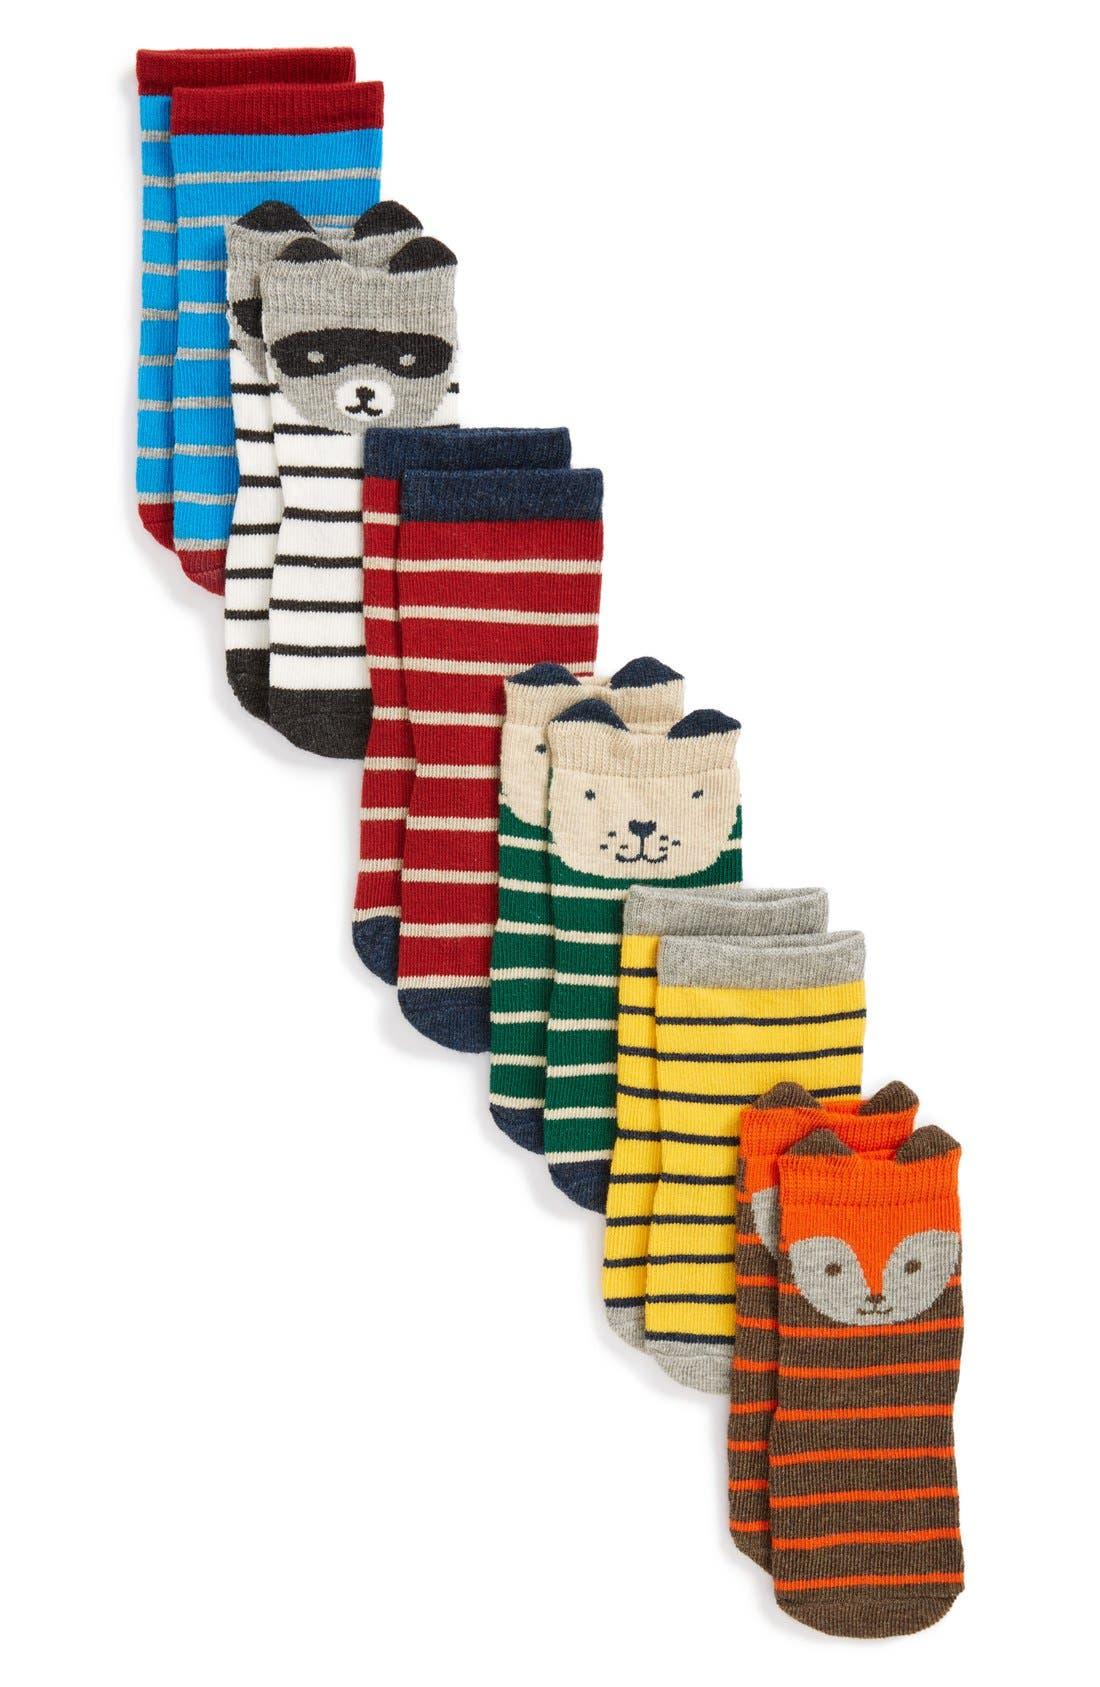 Alternate Image 1 Selected - Tucker + Tate Print 6-Pack Crew Socks (Baby Boys)